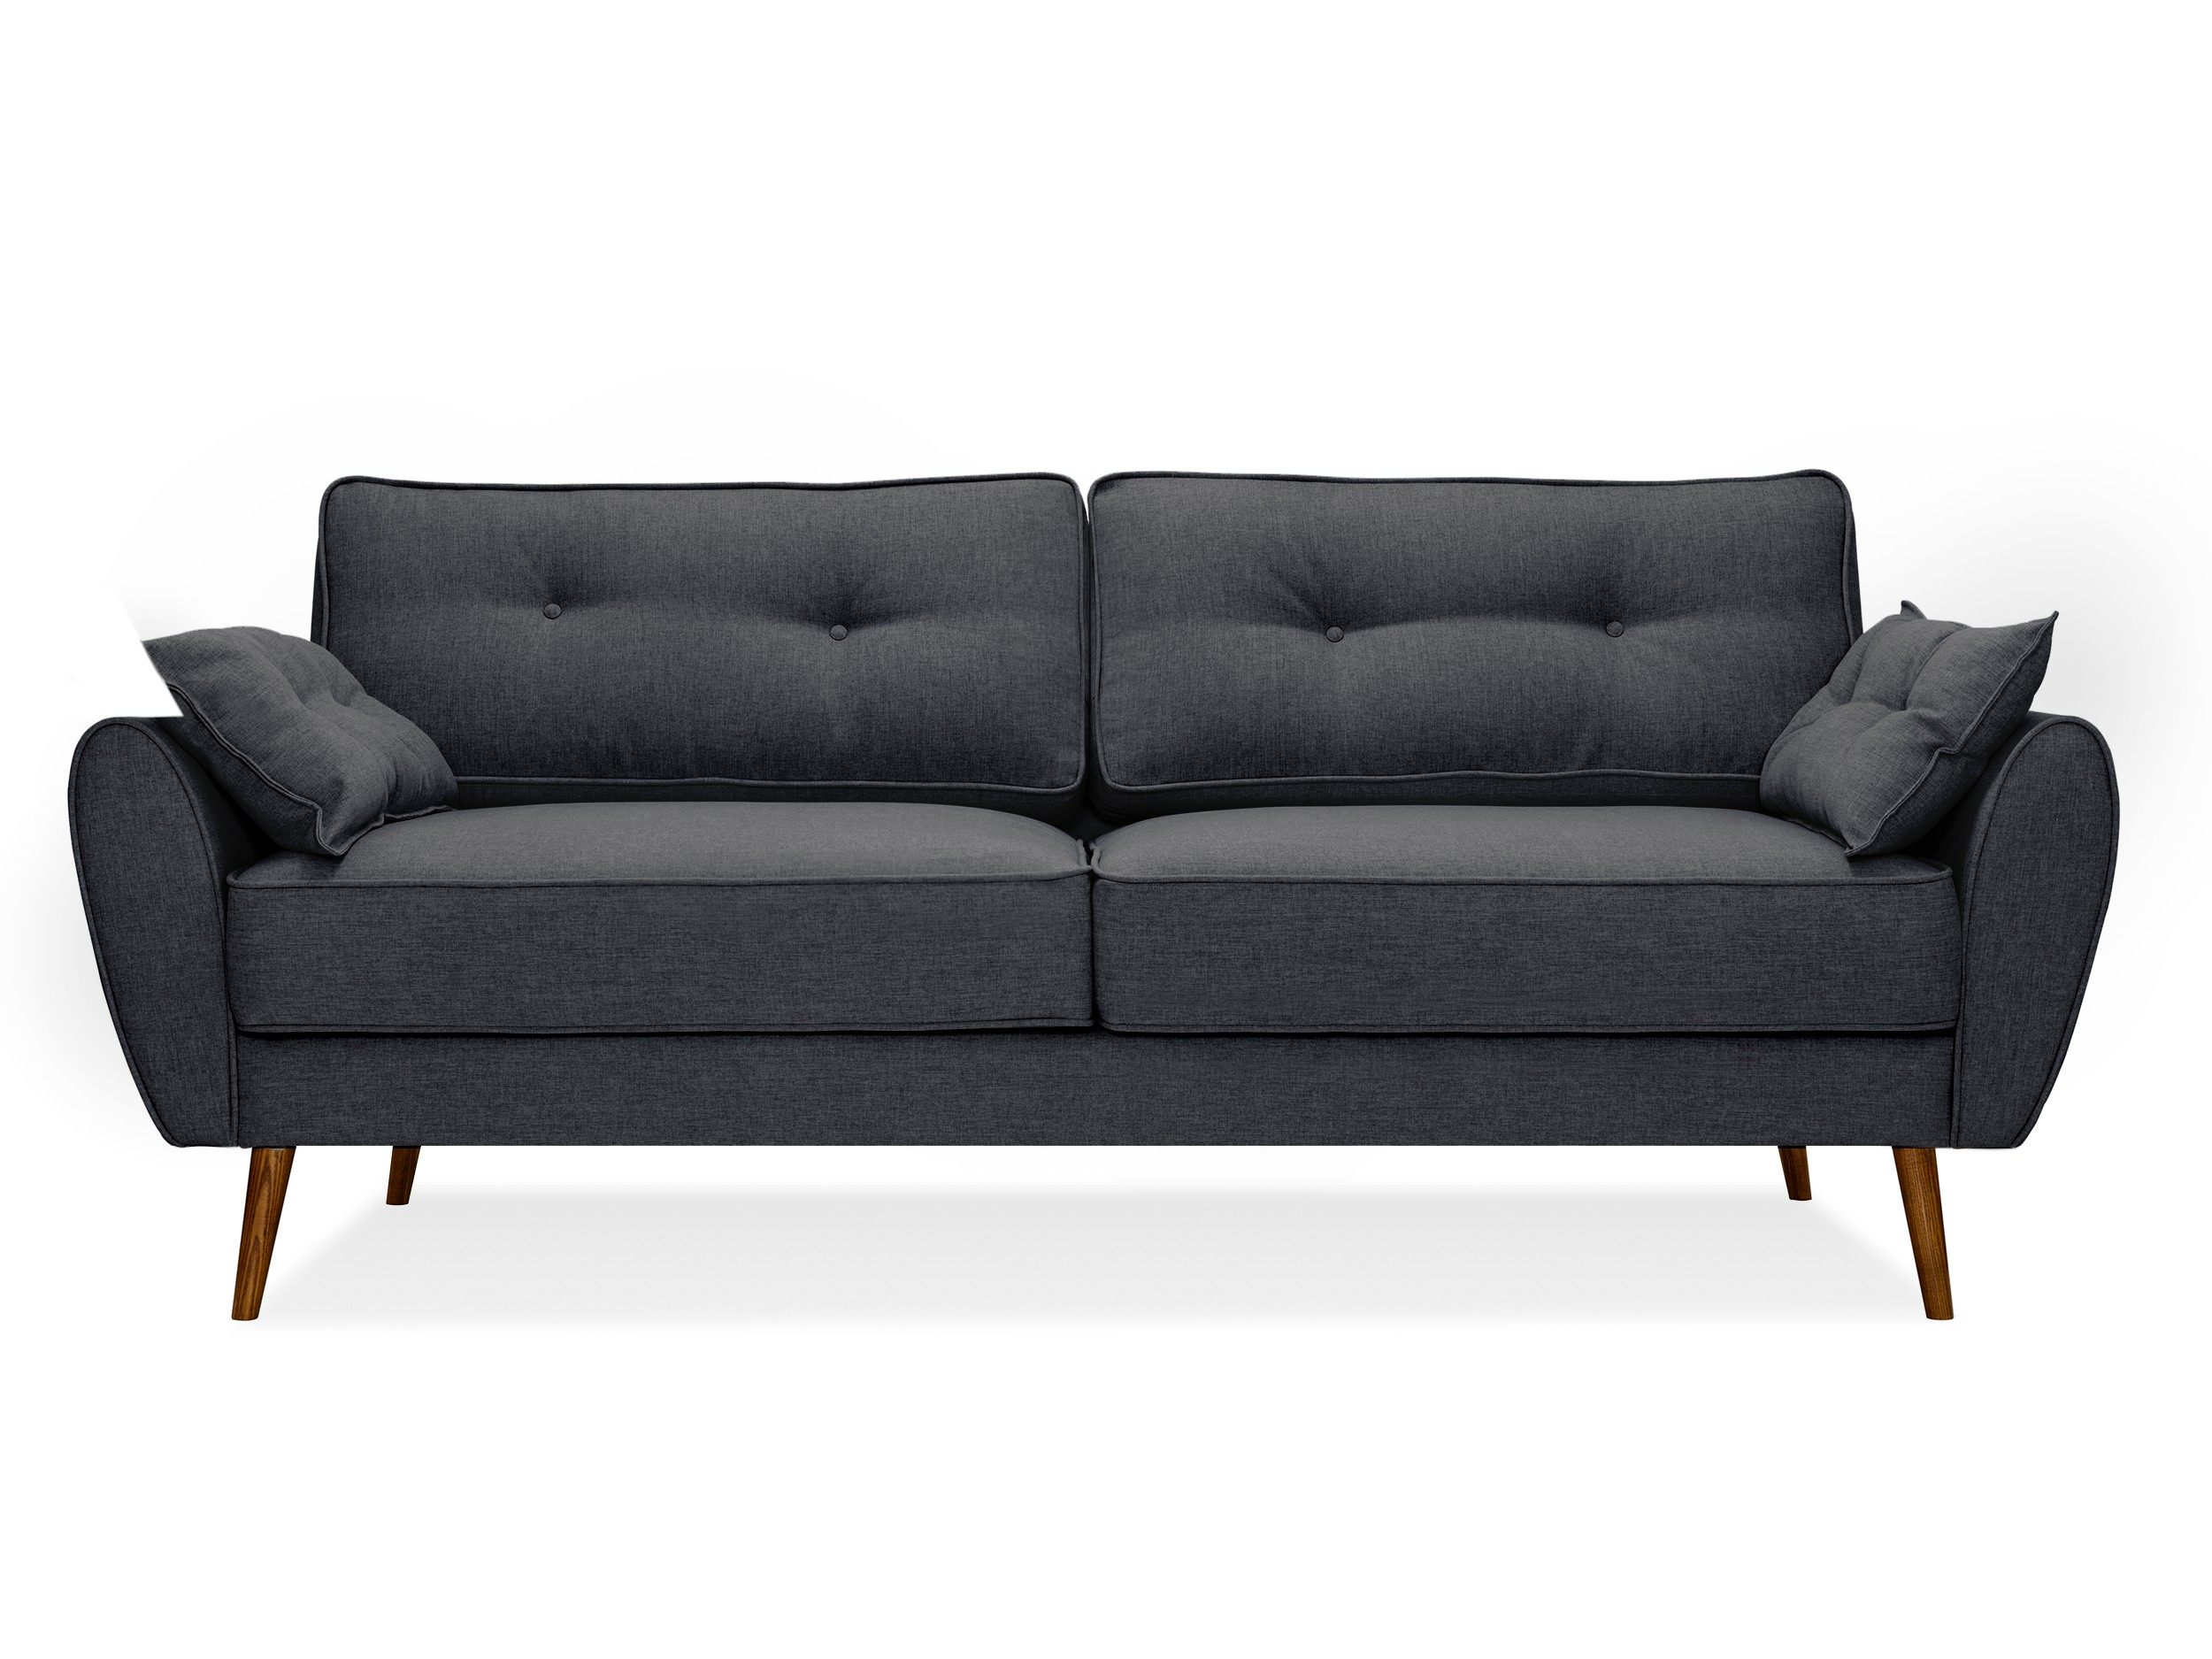 Myfurnish диван vogue серый  66698/14